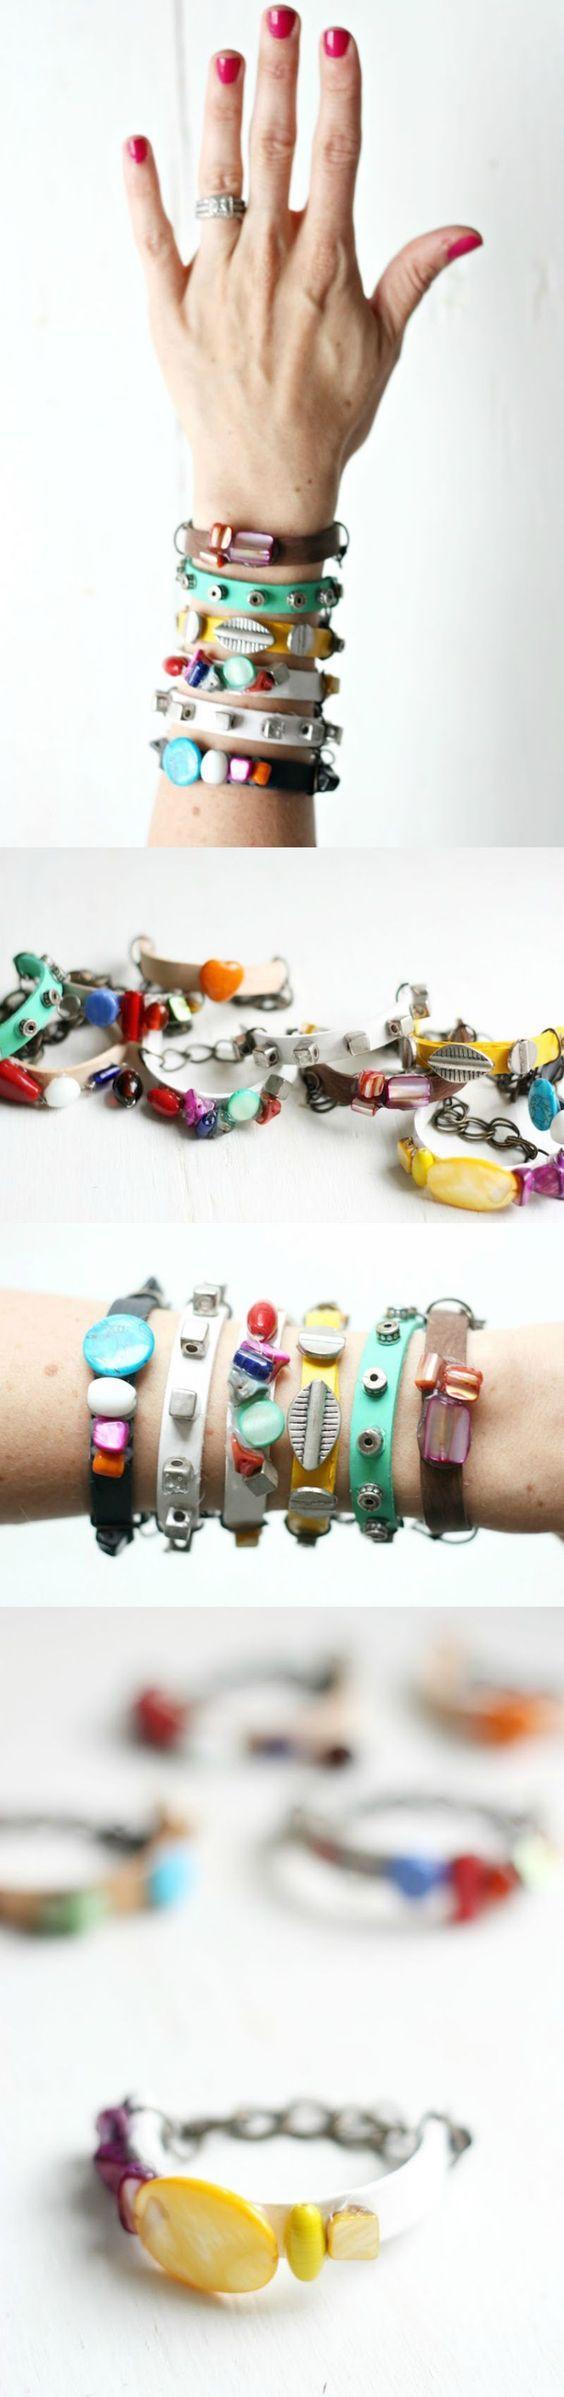 28 best Arts images on Pinterest | Popsicle stick bracelets ...